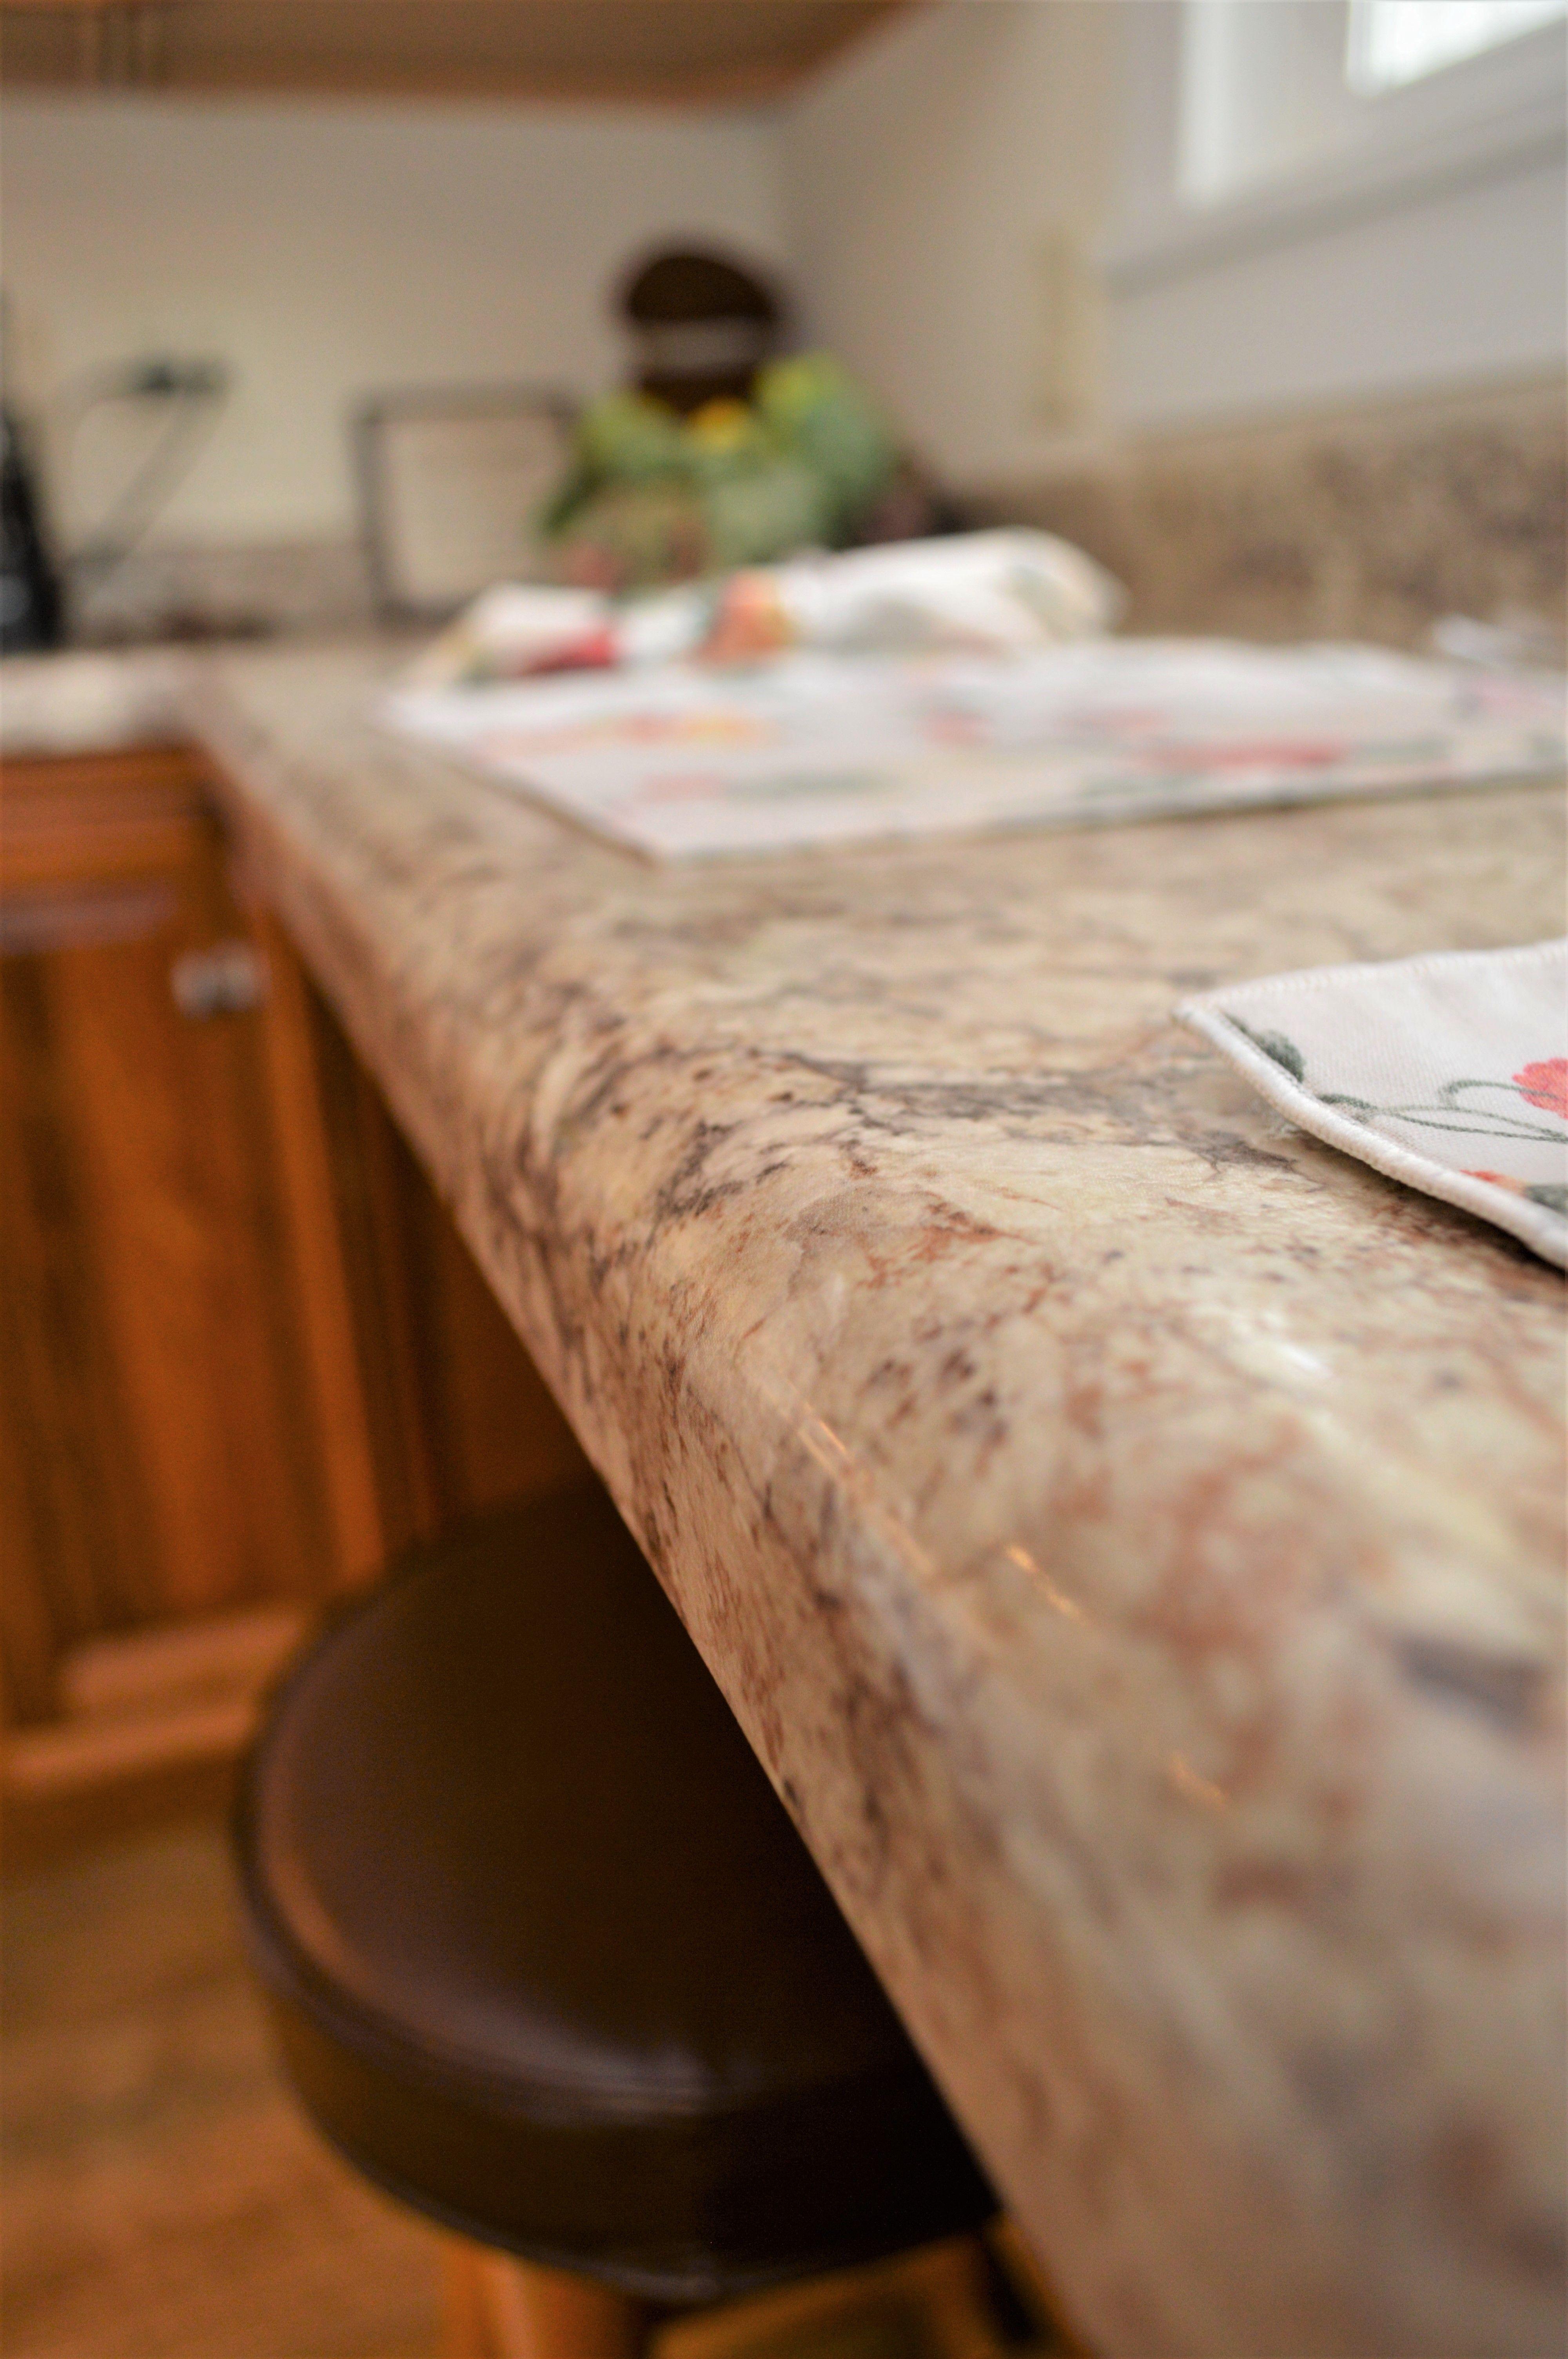 Laminate Countertop Ultra Form Edge Detail Coved Backsplash Autumn Carnival Color Laminate Countertops